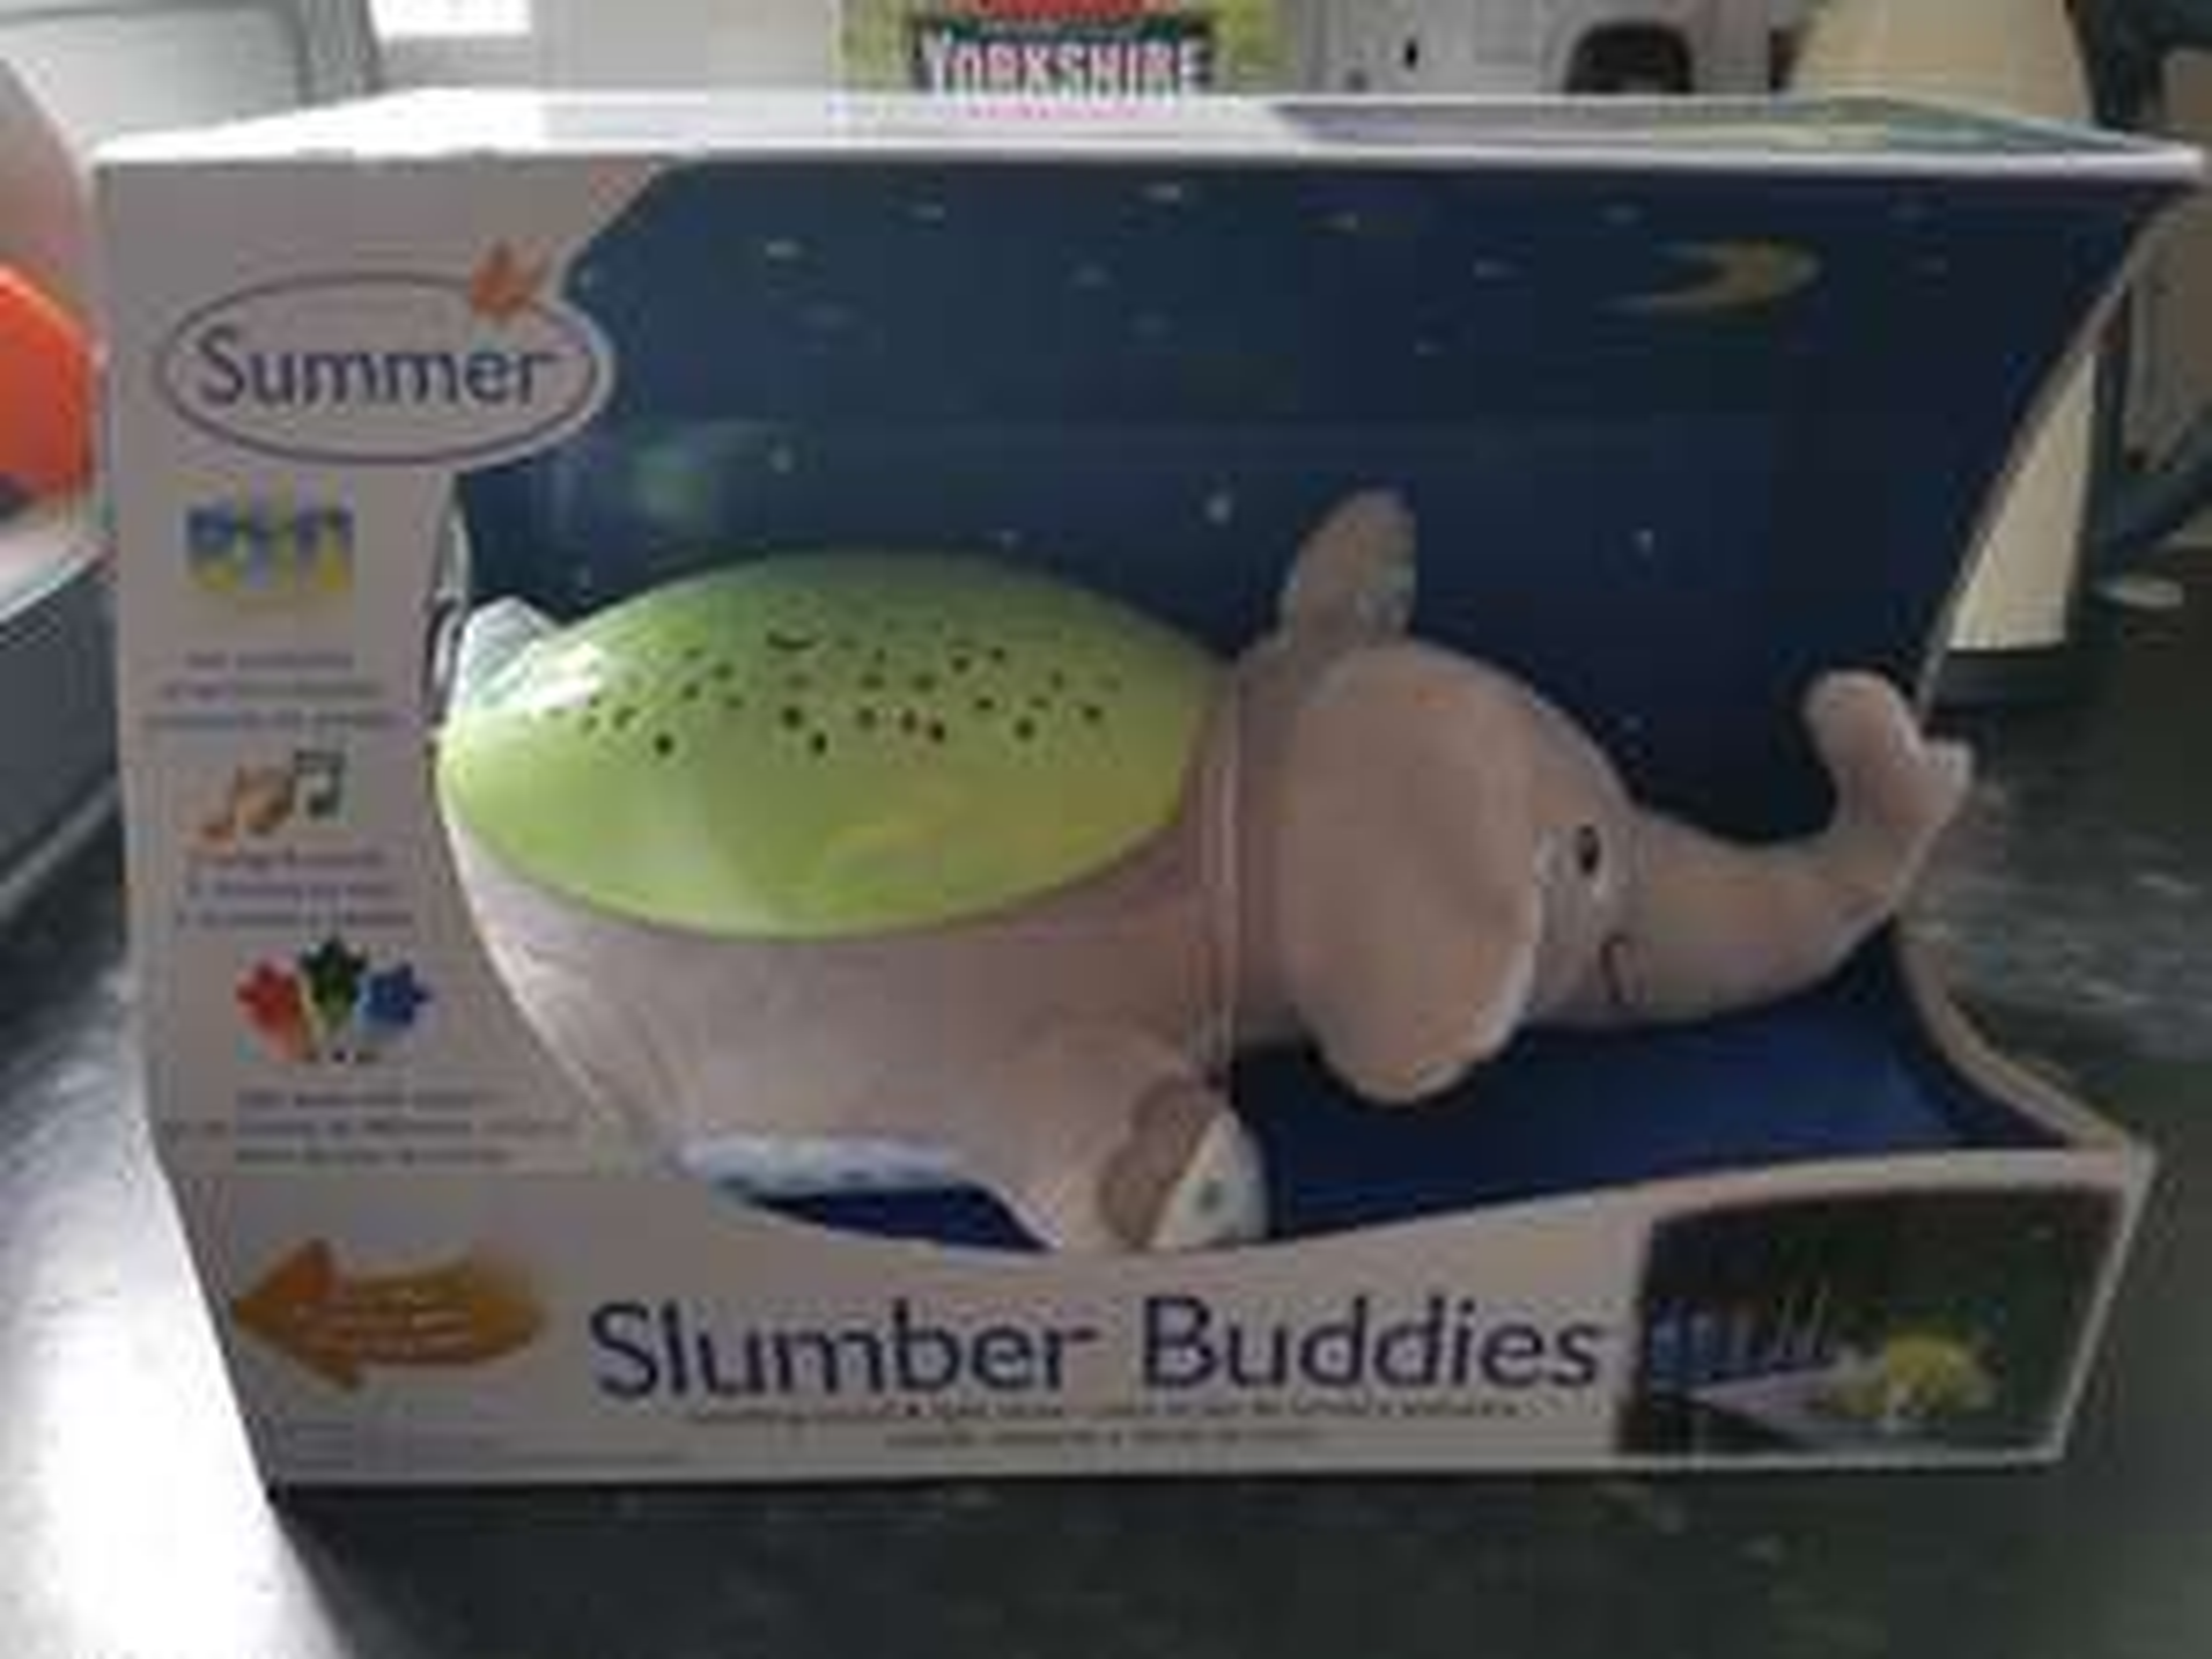 Slumber Buddies Sound & Light Show - £6.24 instore @ Tesco (Ryde)